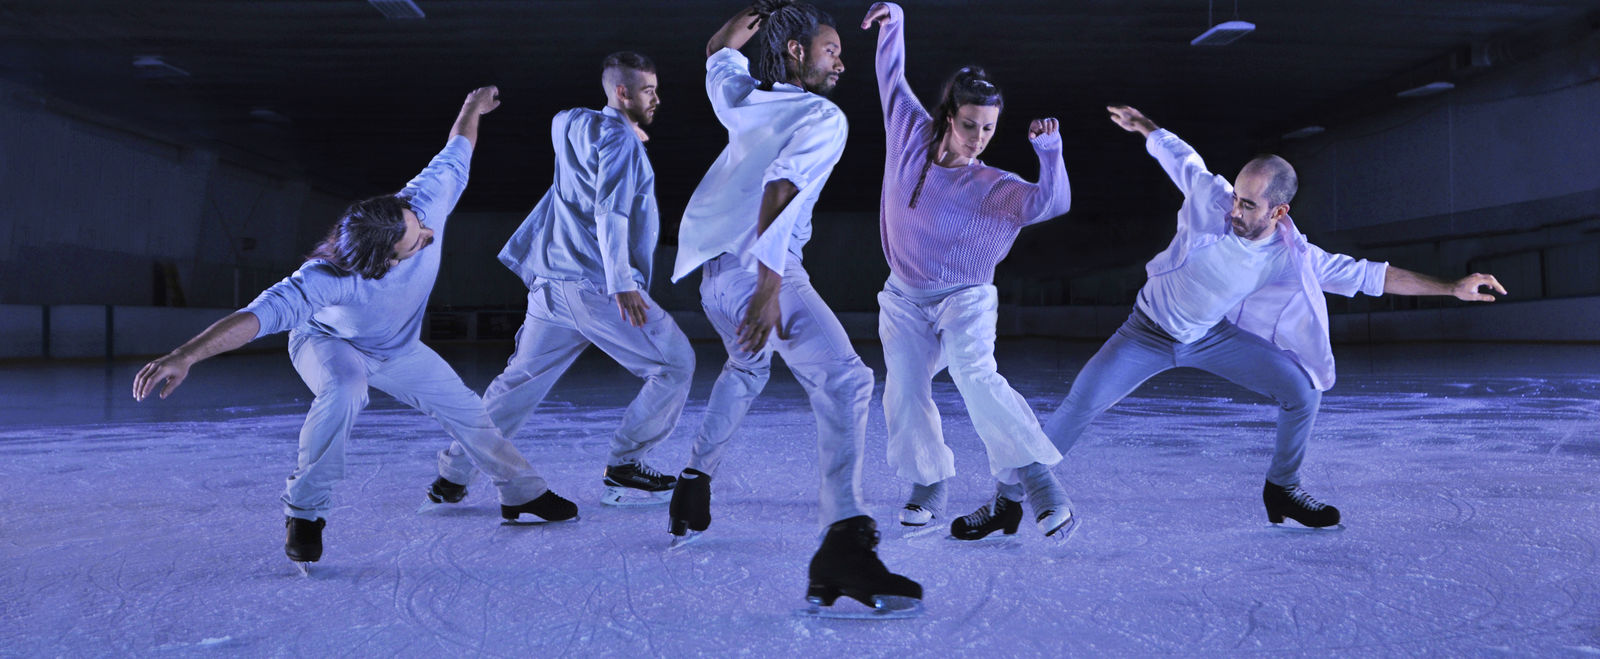 Men dance and ice skate.